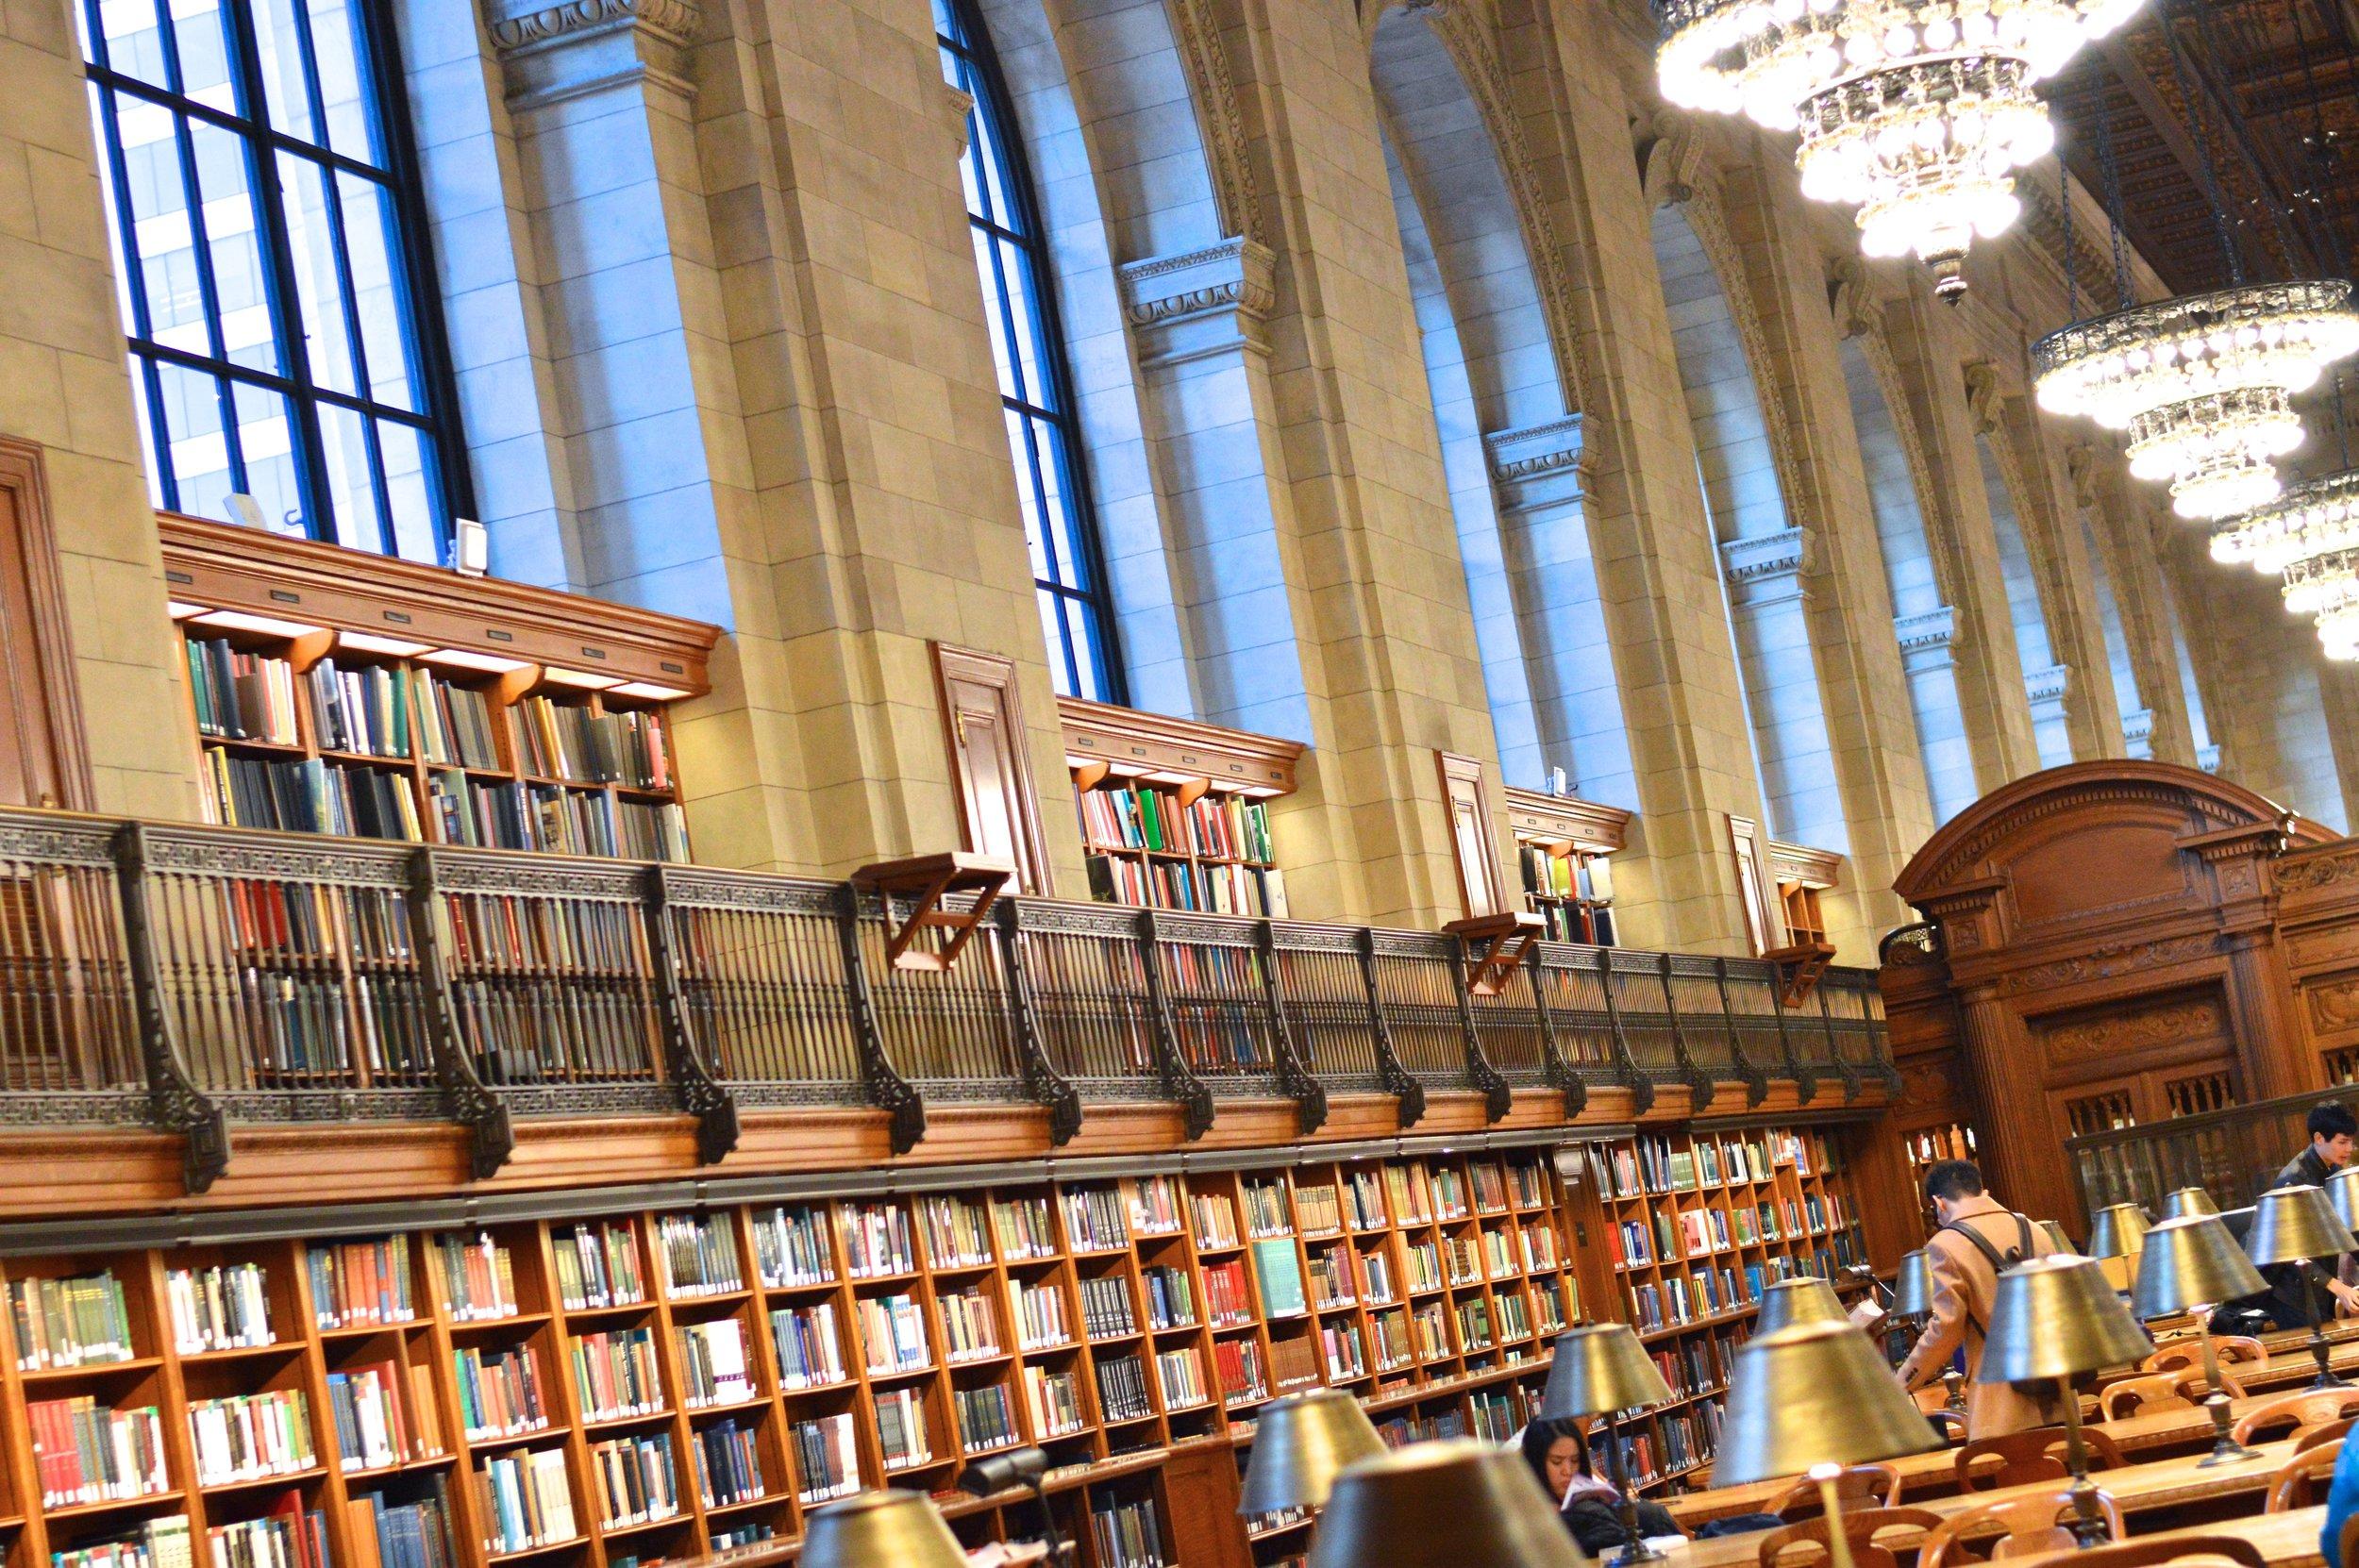 Bryant Park New York Public Library 19.jpg